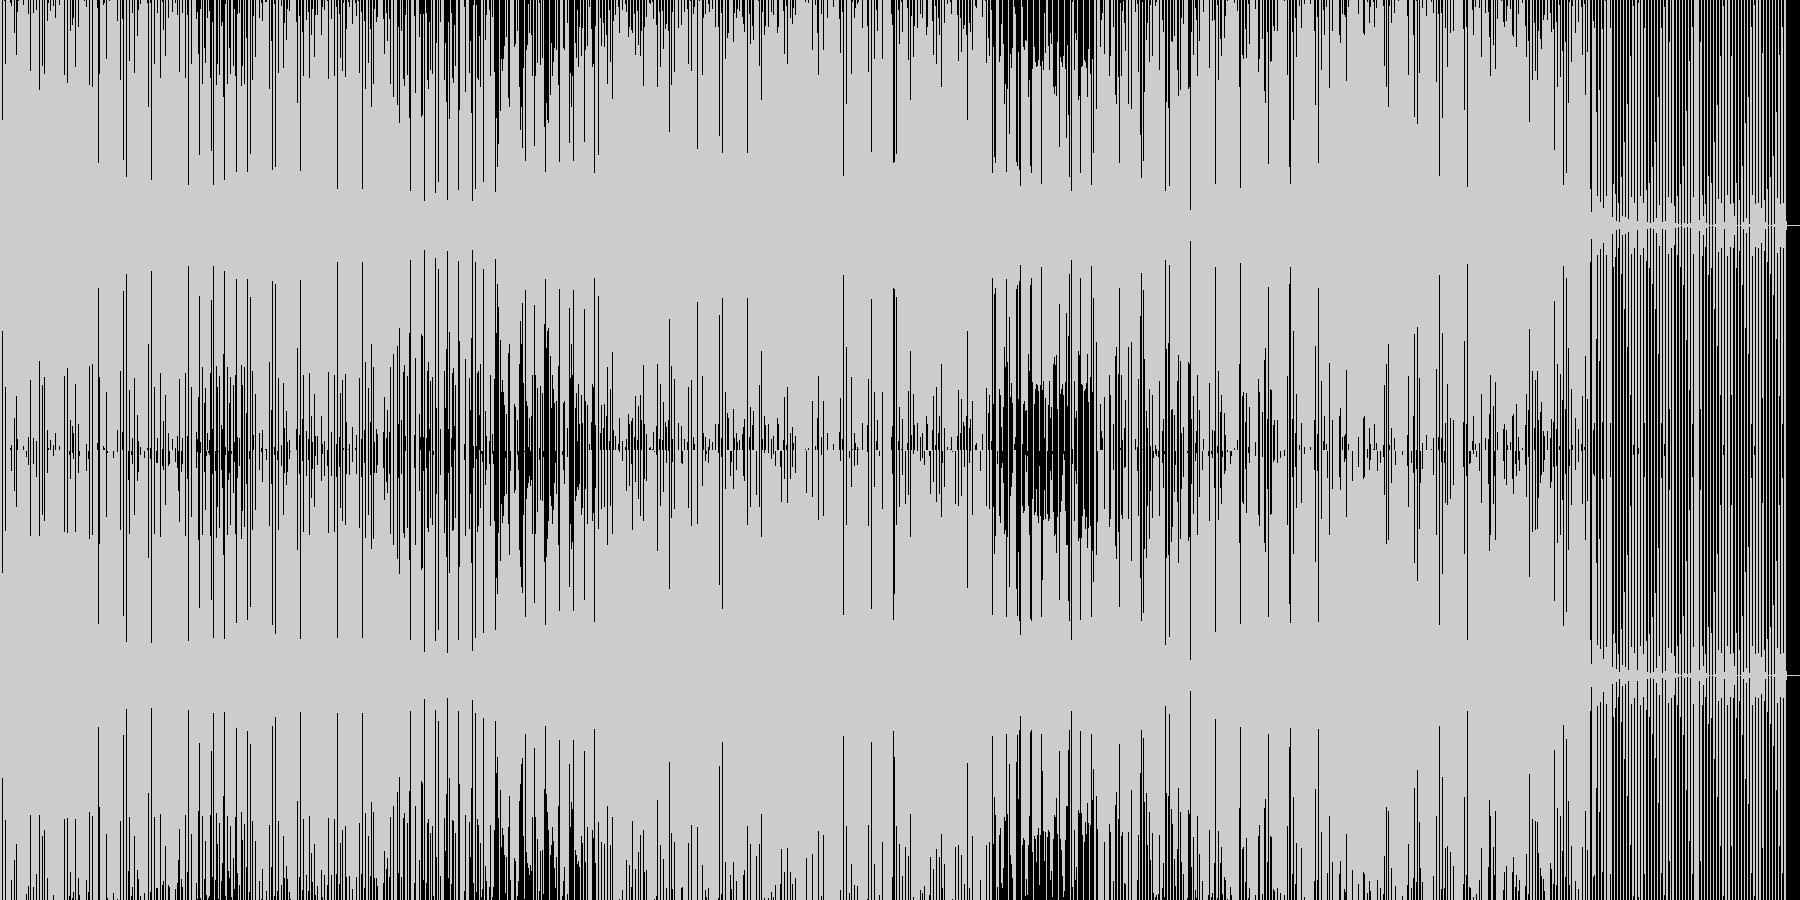 minimal house 37  の未再生の波形